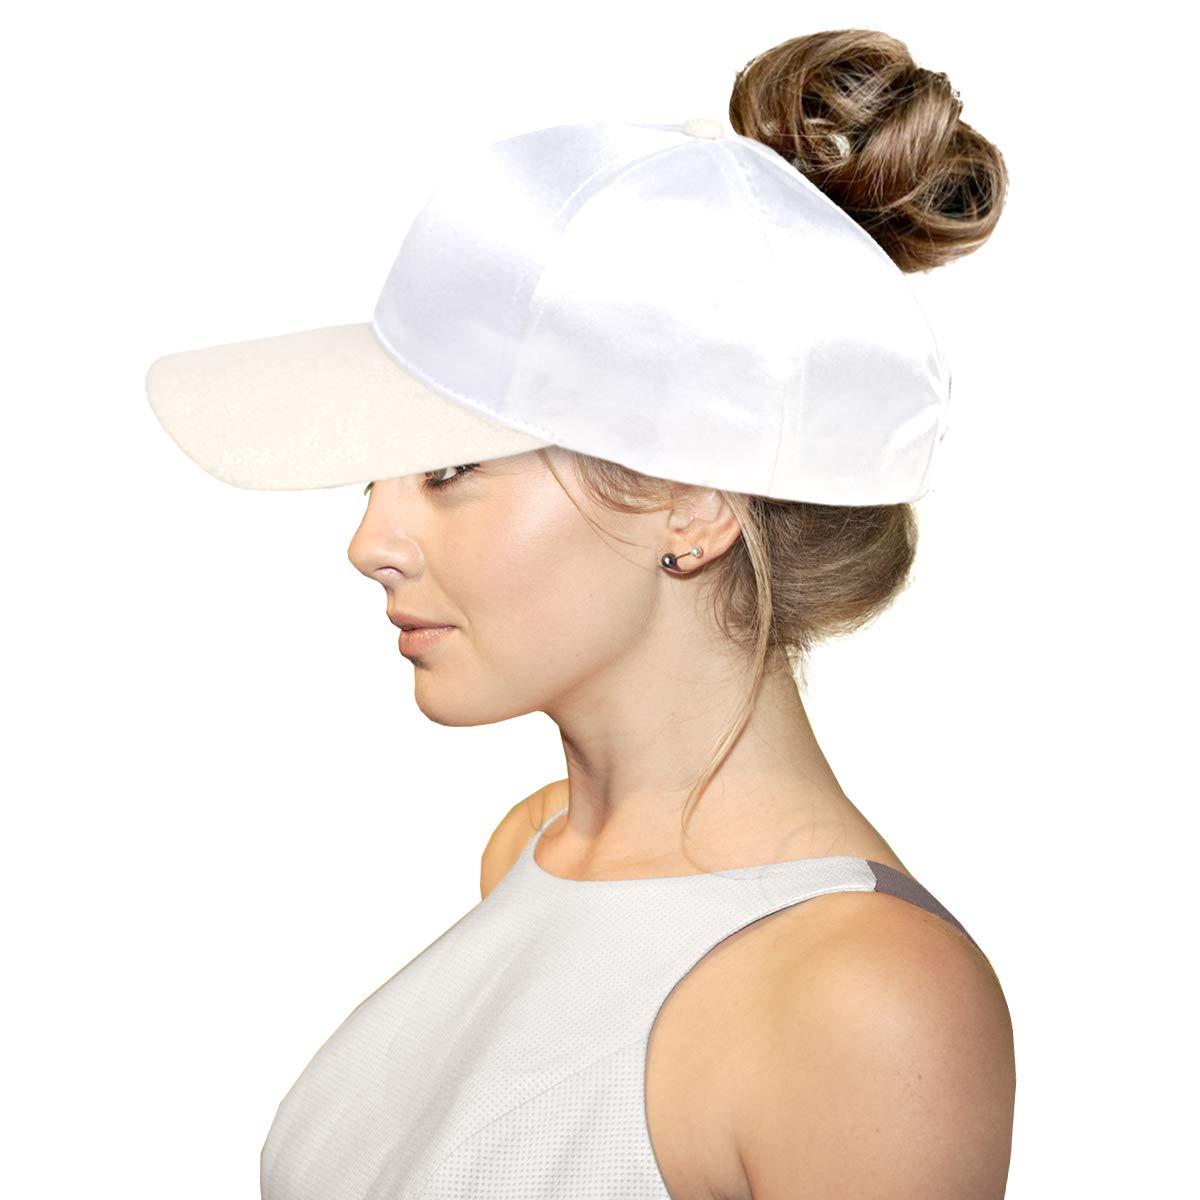 FADA Glitter Ponycap Messy High Bun Ponytail Baseball Cap Trucker Hat for Women